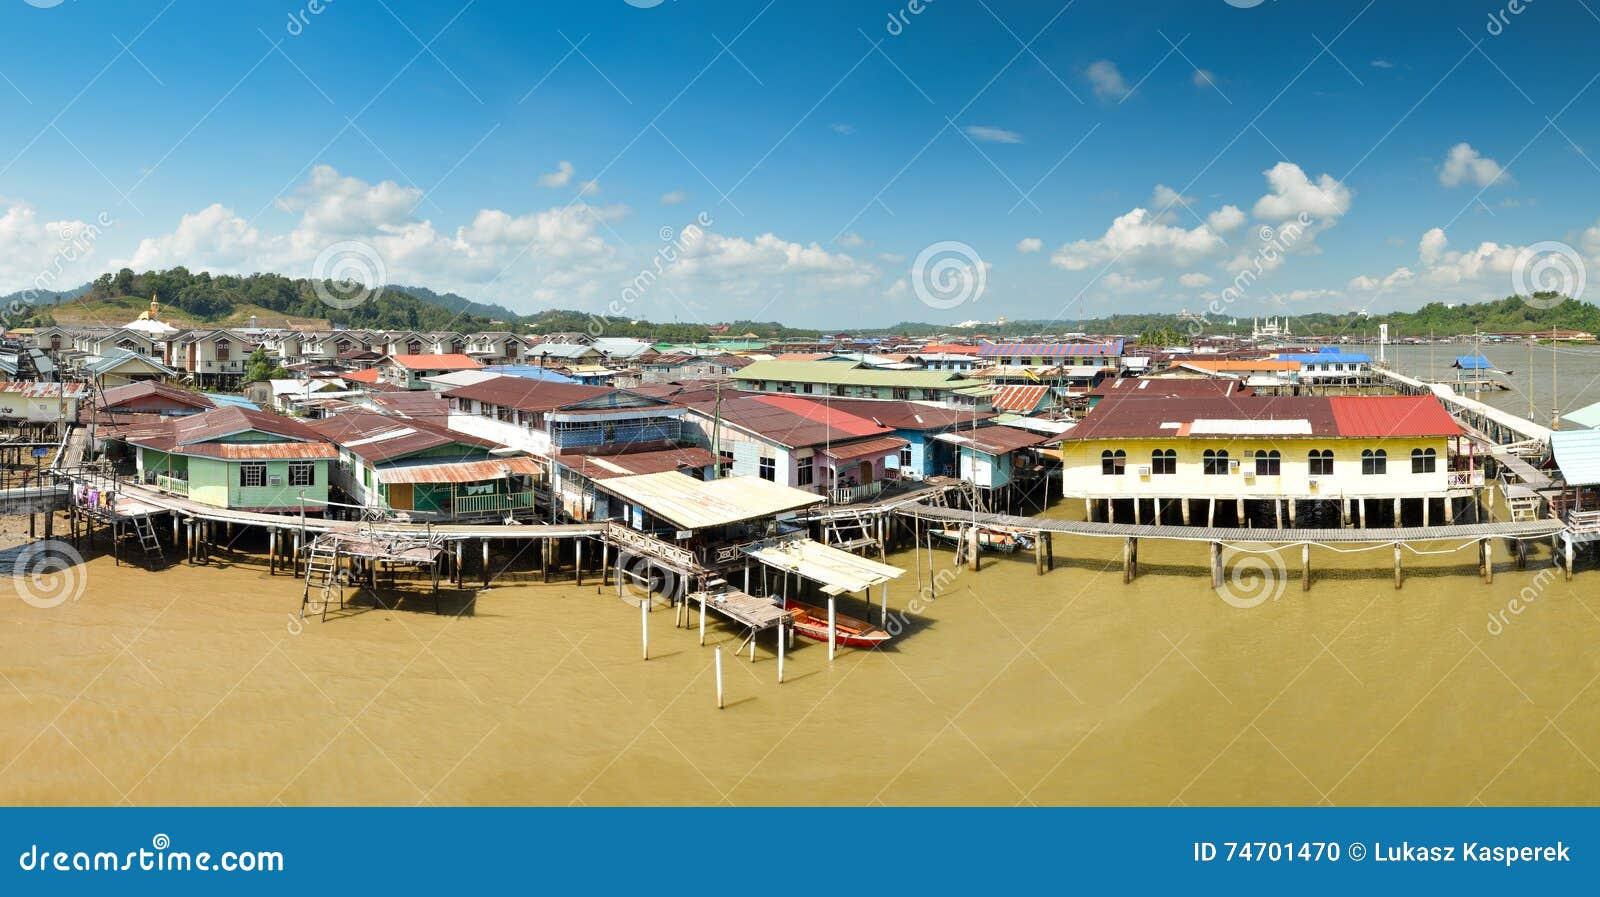 Panorama de Ayer do Kampong, Brunei Darussalam